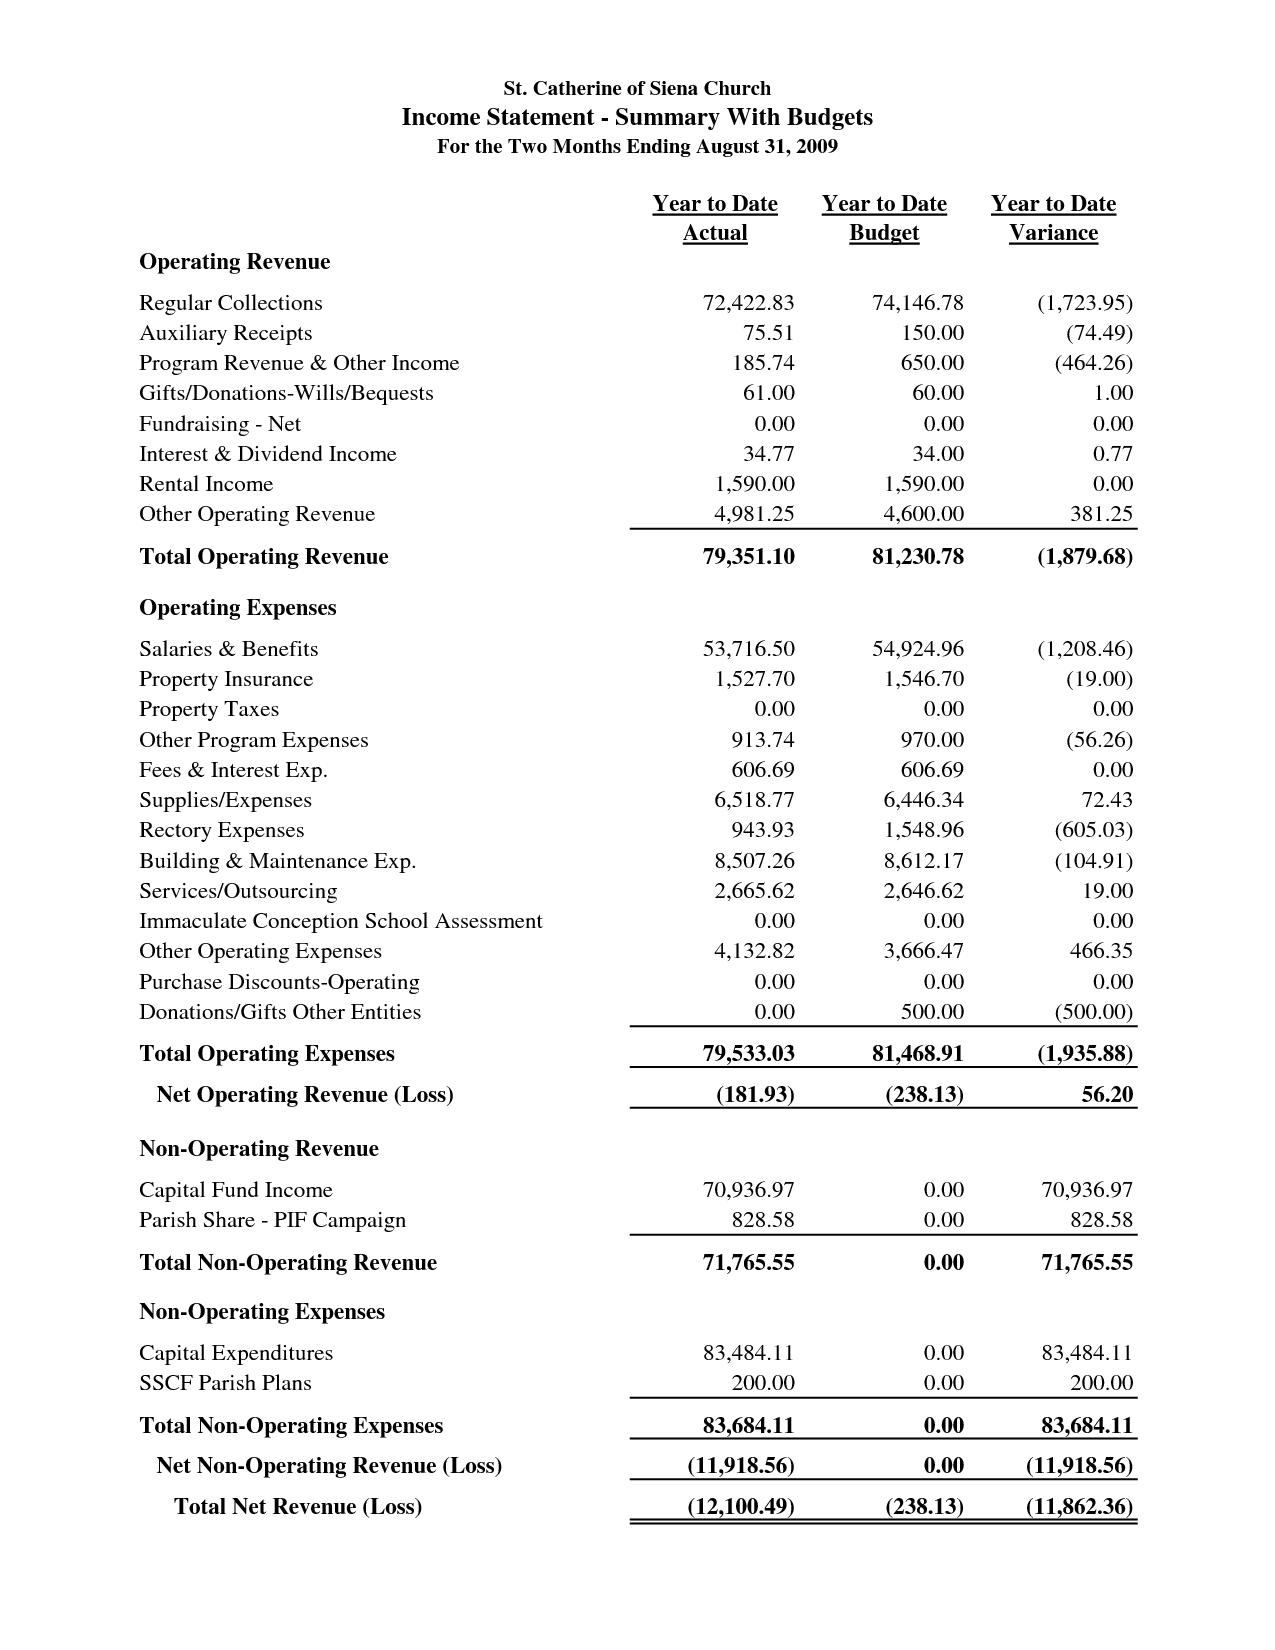 Church Income Statement Template